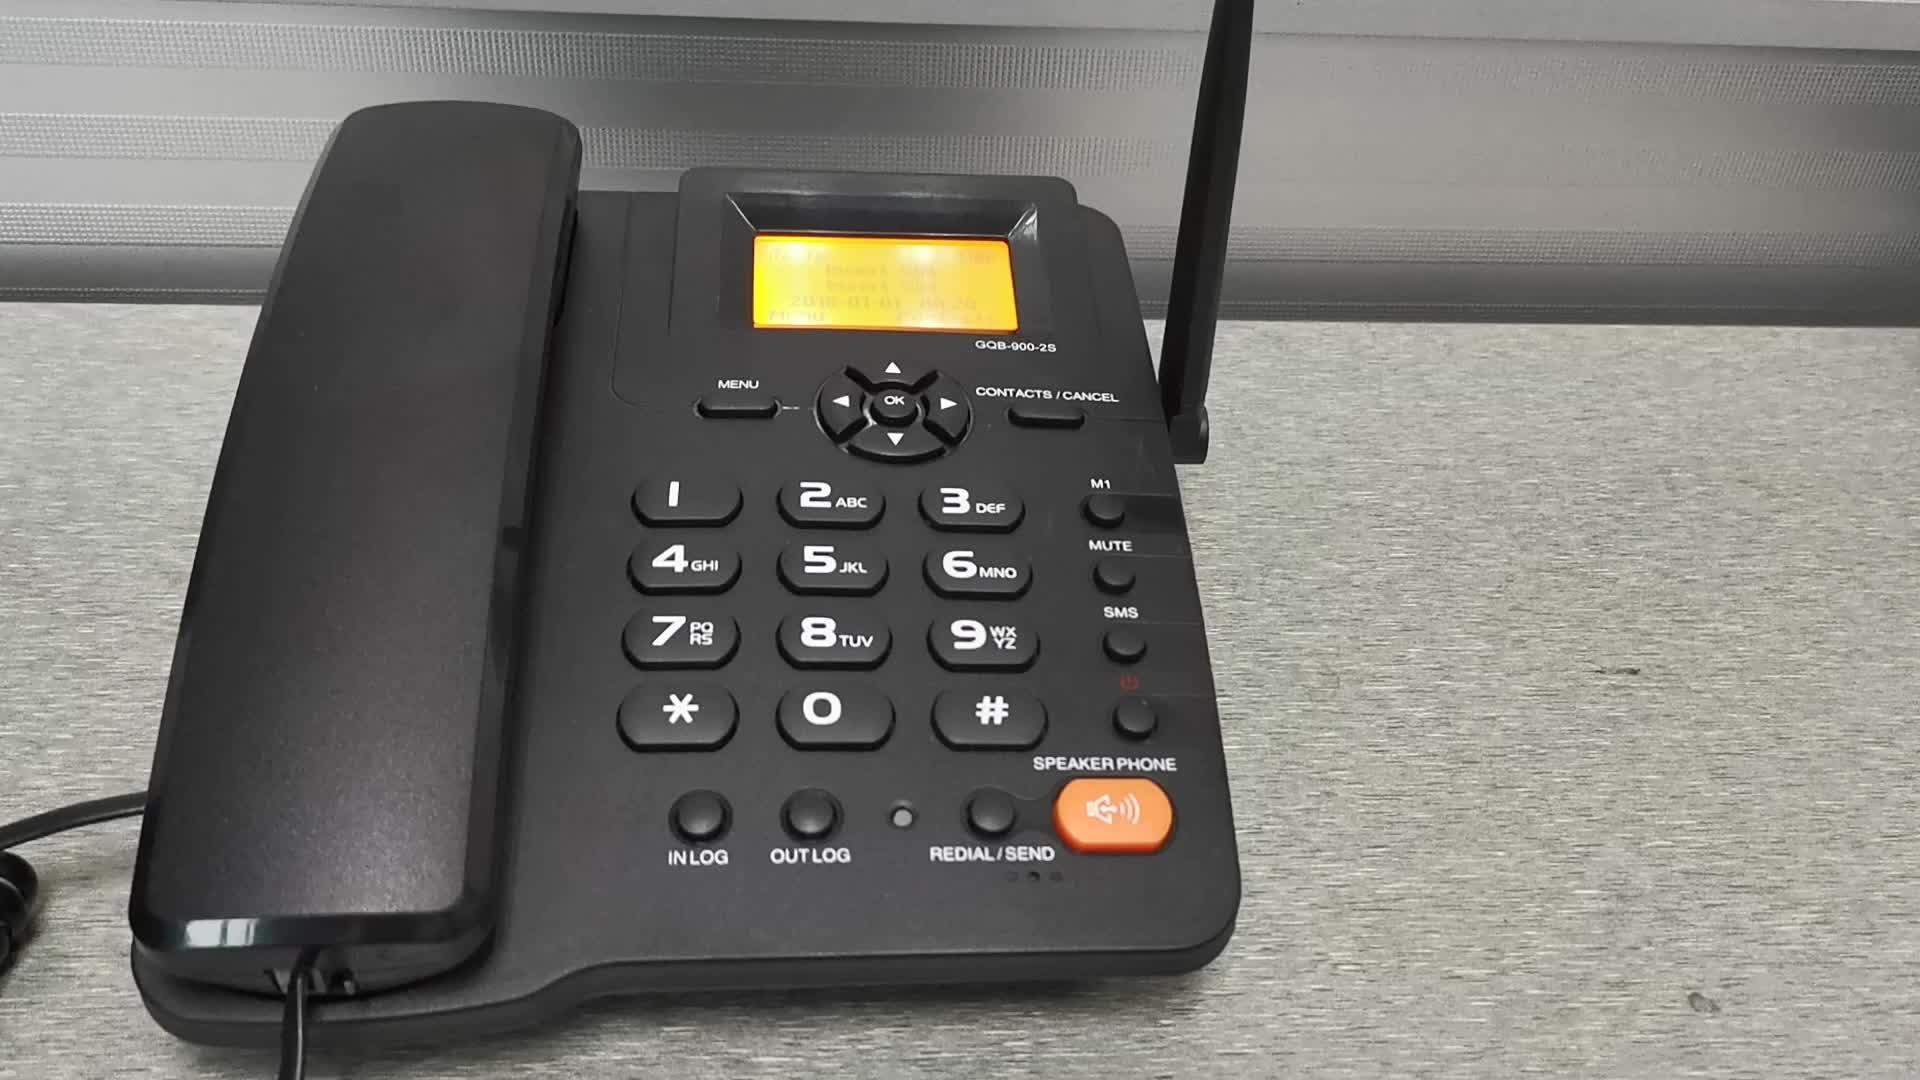 ESN-3B1 GSM 2G Dua Dual SIM Fixed Wireless Desktop Ponsel Cordless Telepon Fwp